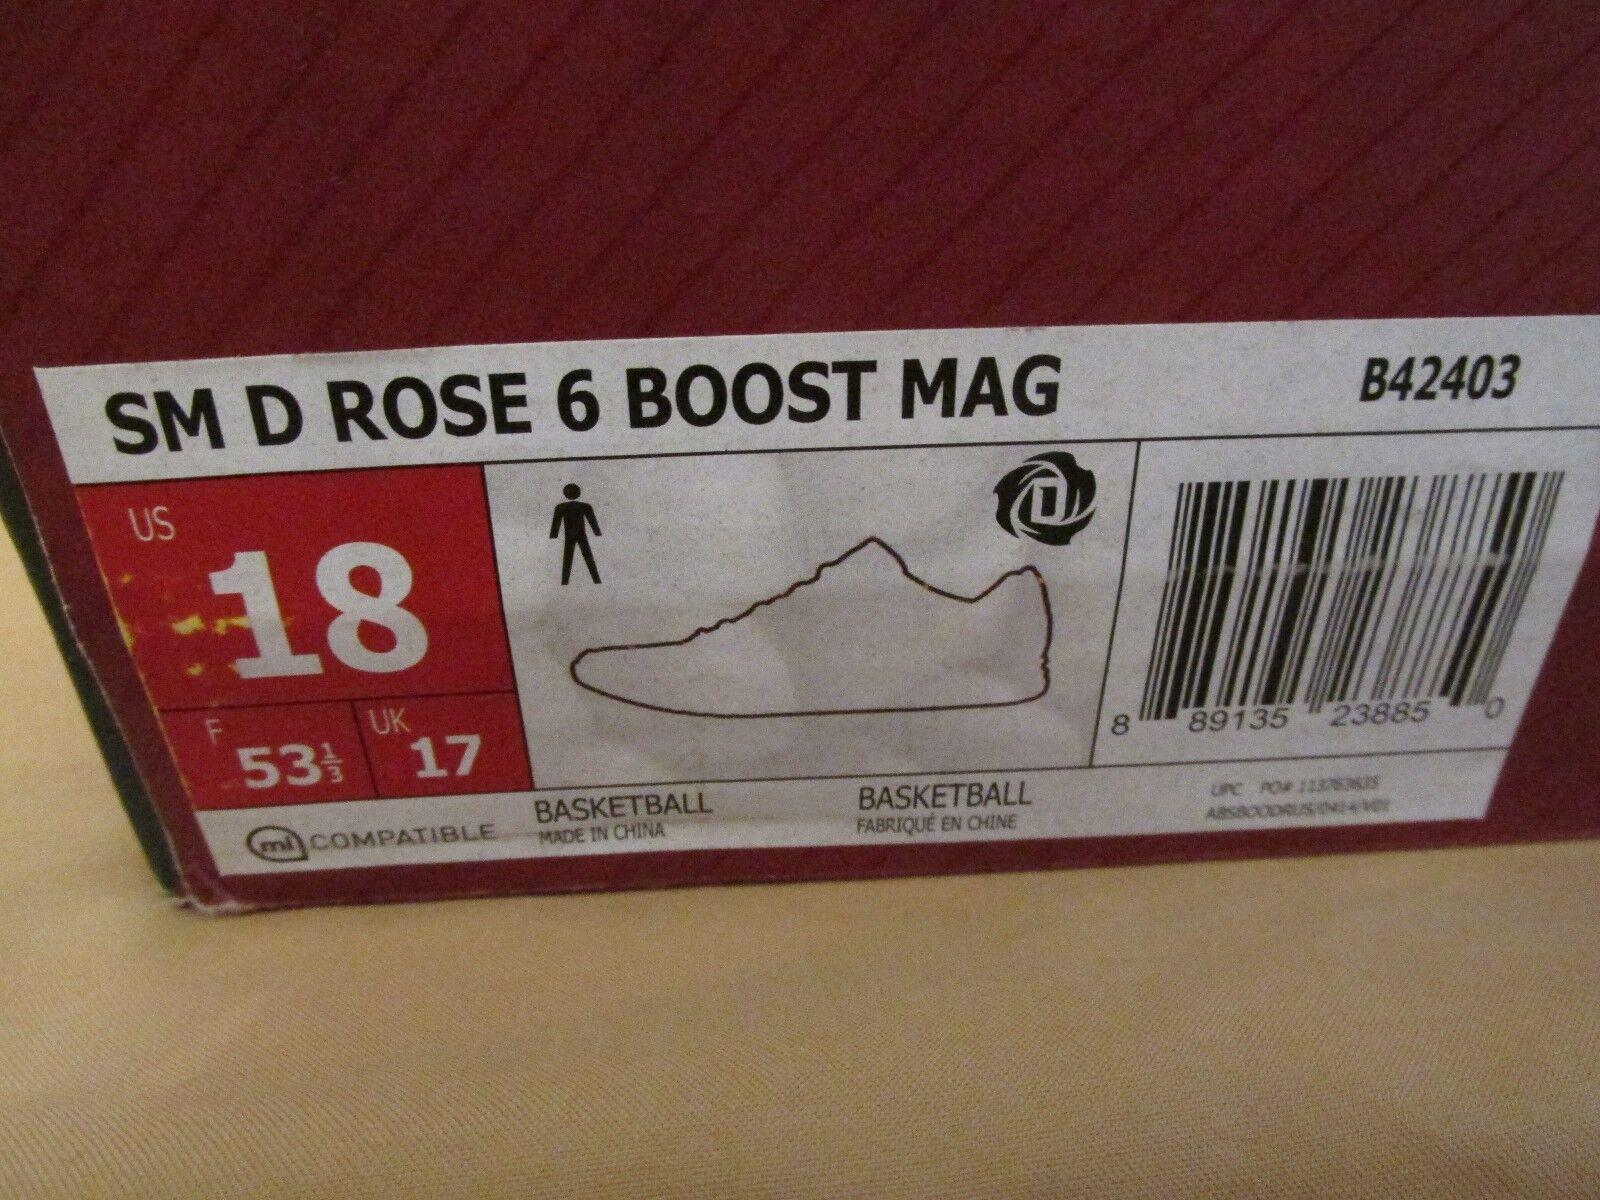 Nuove adidas s american rose 6 impulso mcdonald's all - american s game scarpe rosse numero 18 b42403 f14d3d